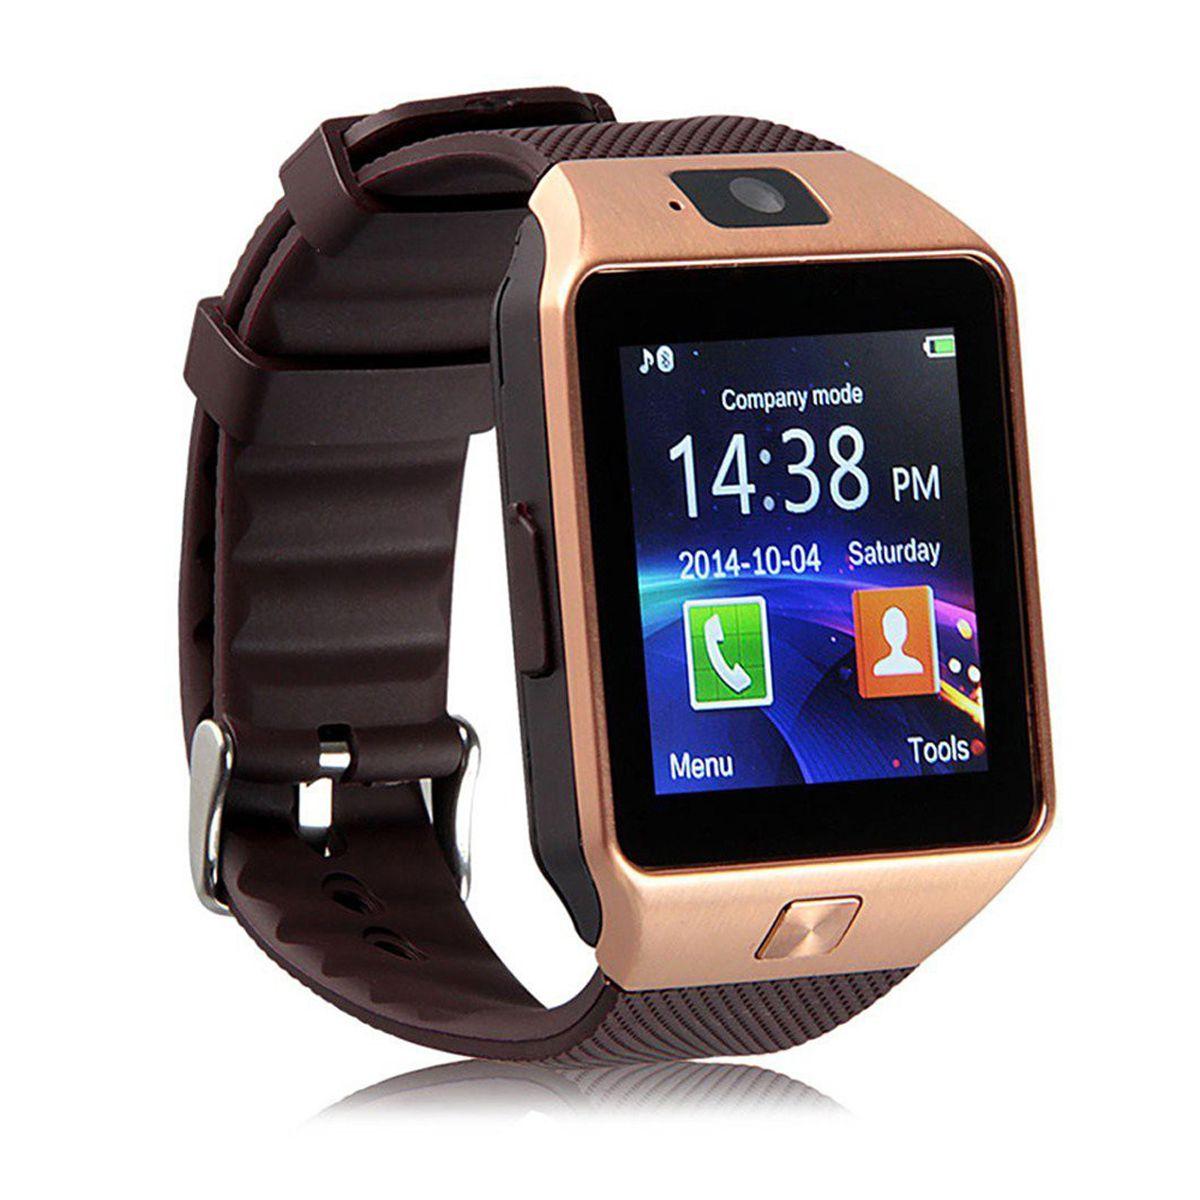 Over Tech Smartwatch Suited Lava A50 Dz09 Golden Smart Watches